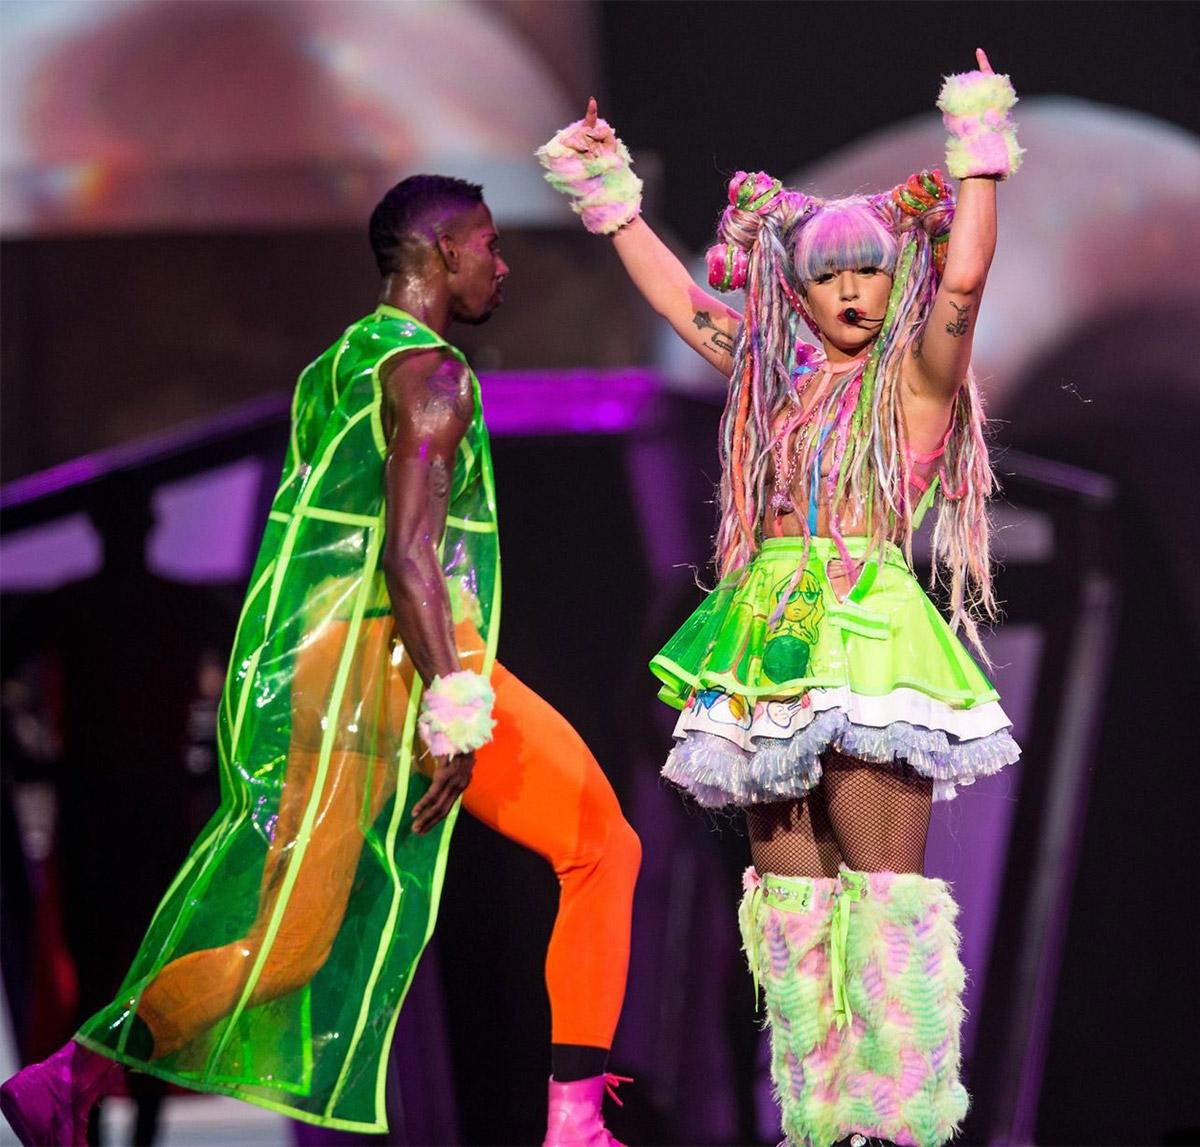 Neon Orange Mens Tights Art Pop Ladygaga